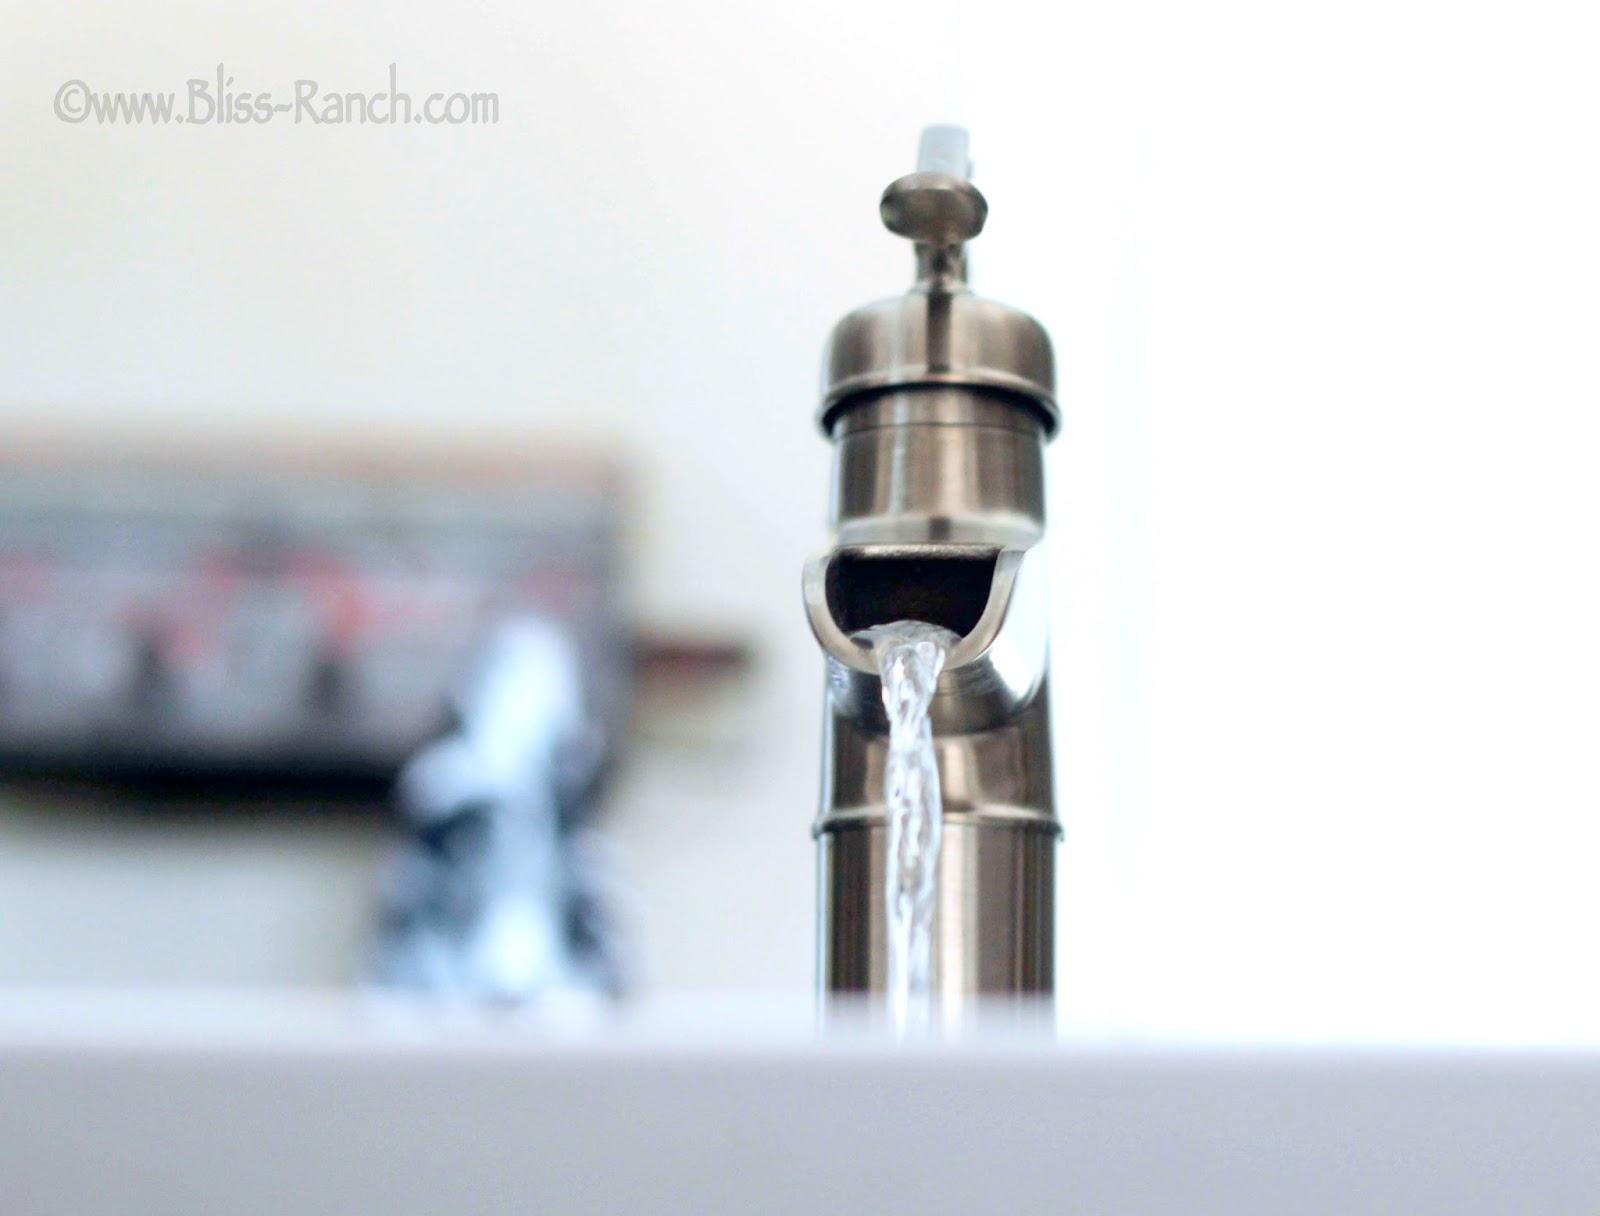 Price Pfister Faucet Bathroom Redo Bliss Ranch.com